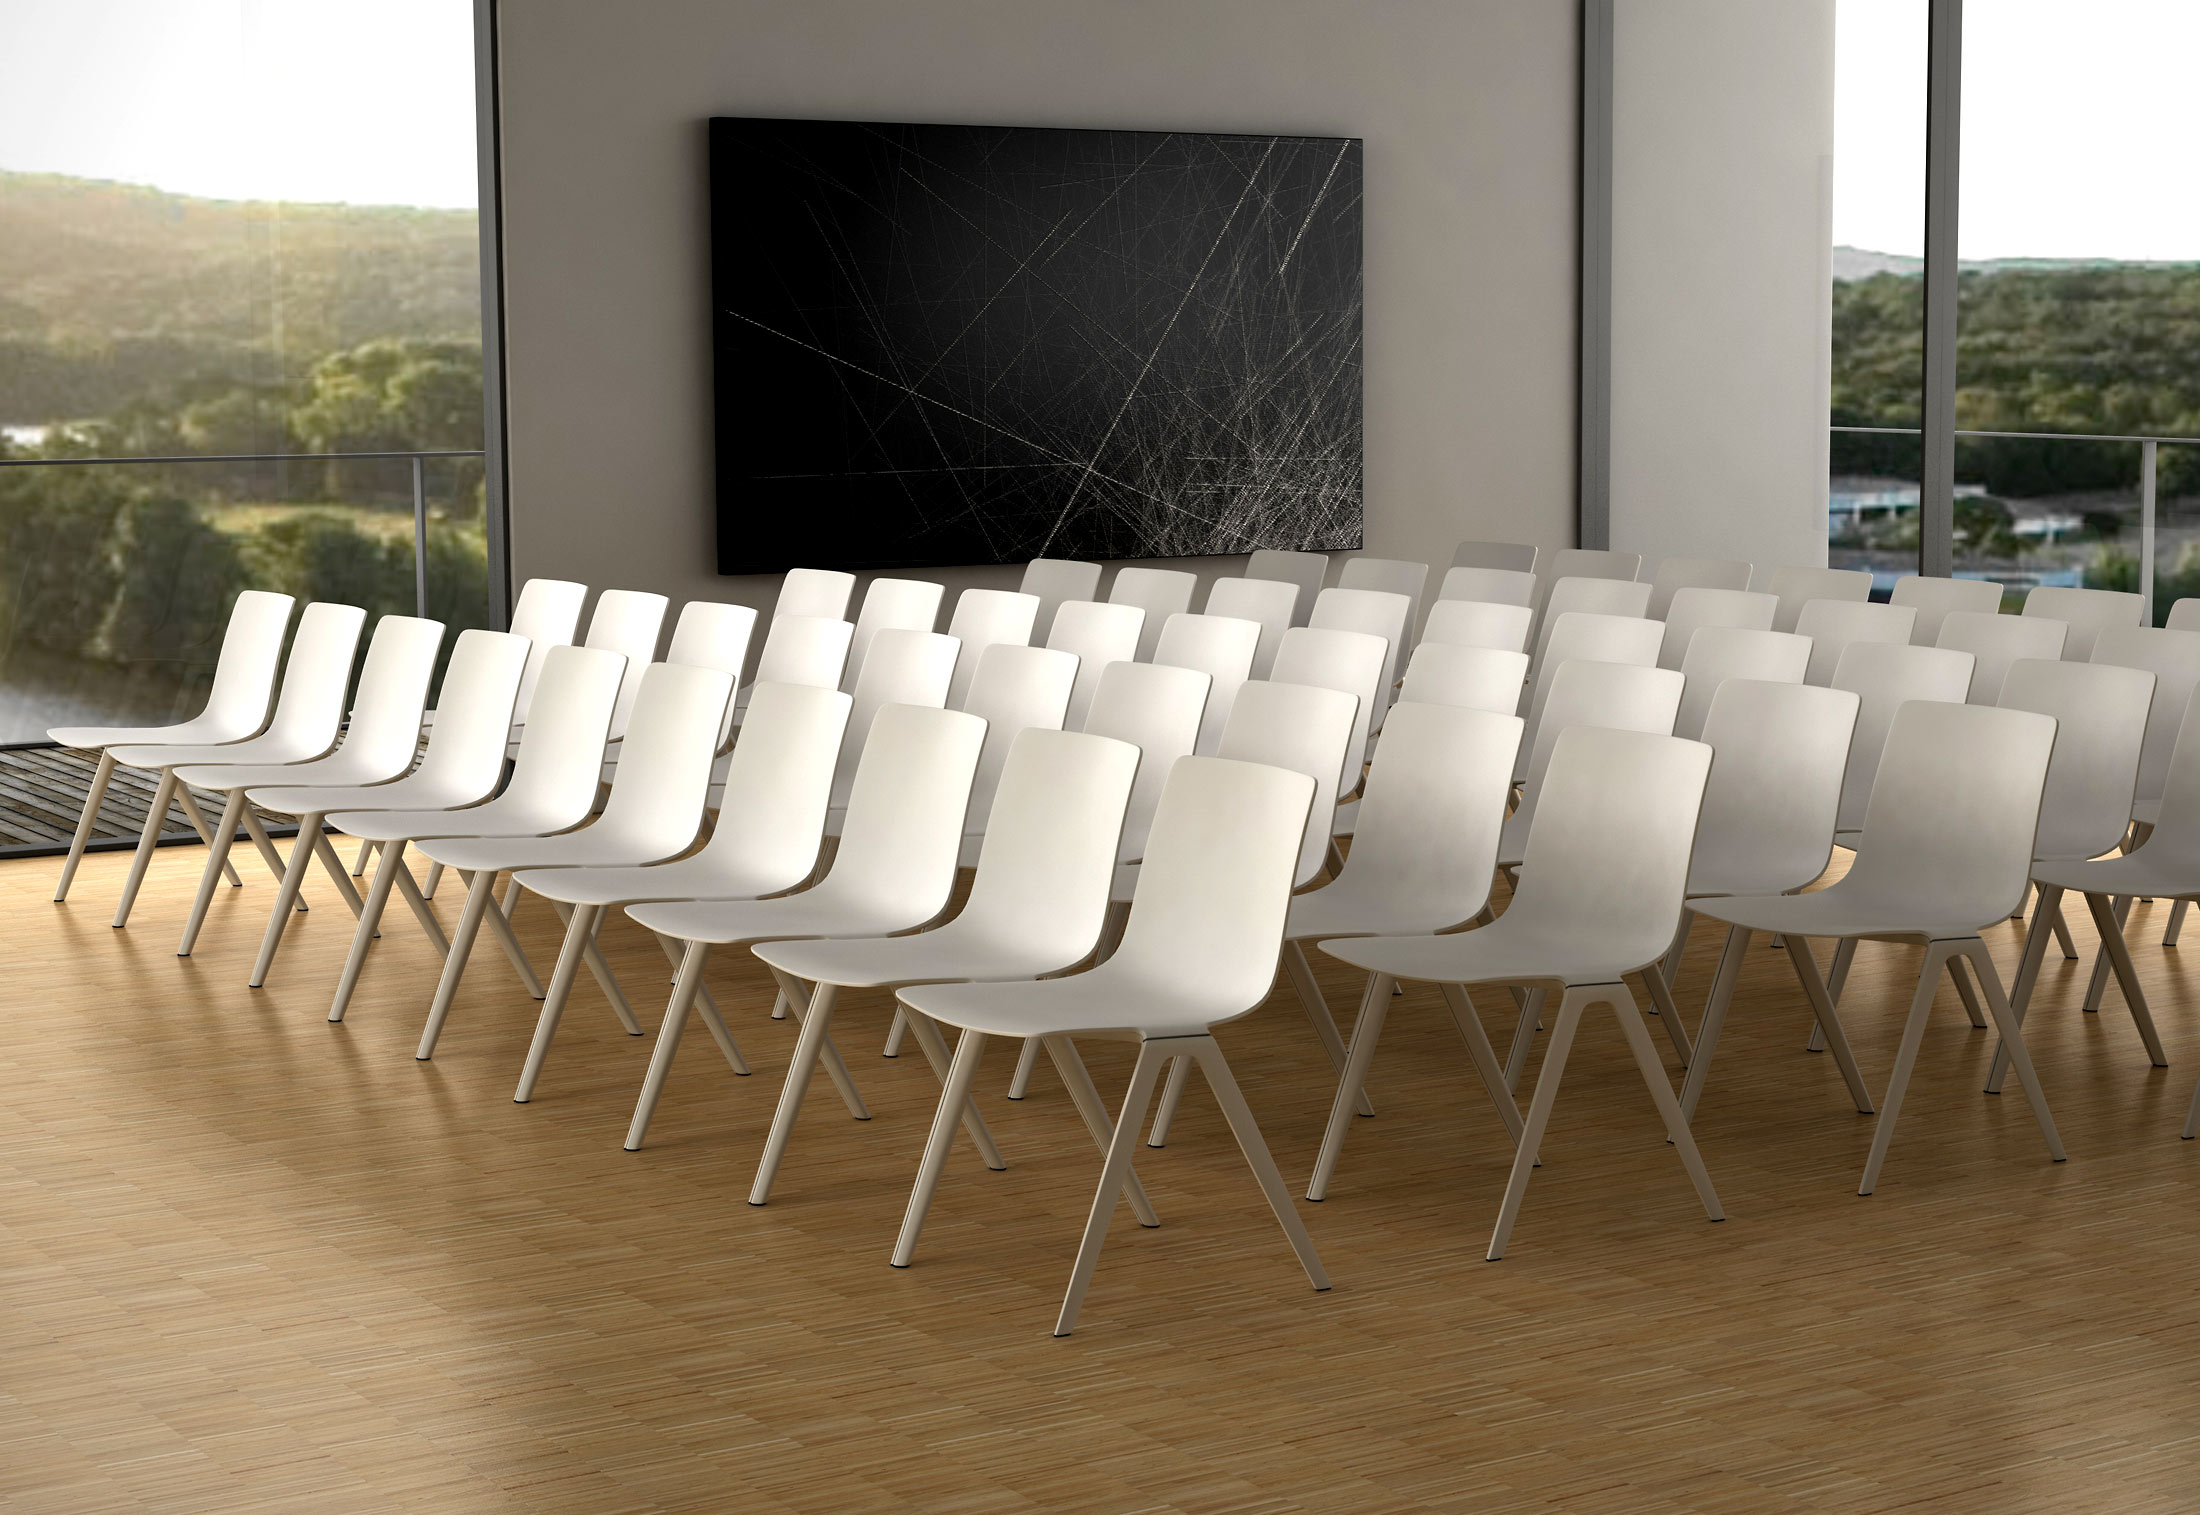 A-Chair 9708 by Brunner | STYLEPARK